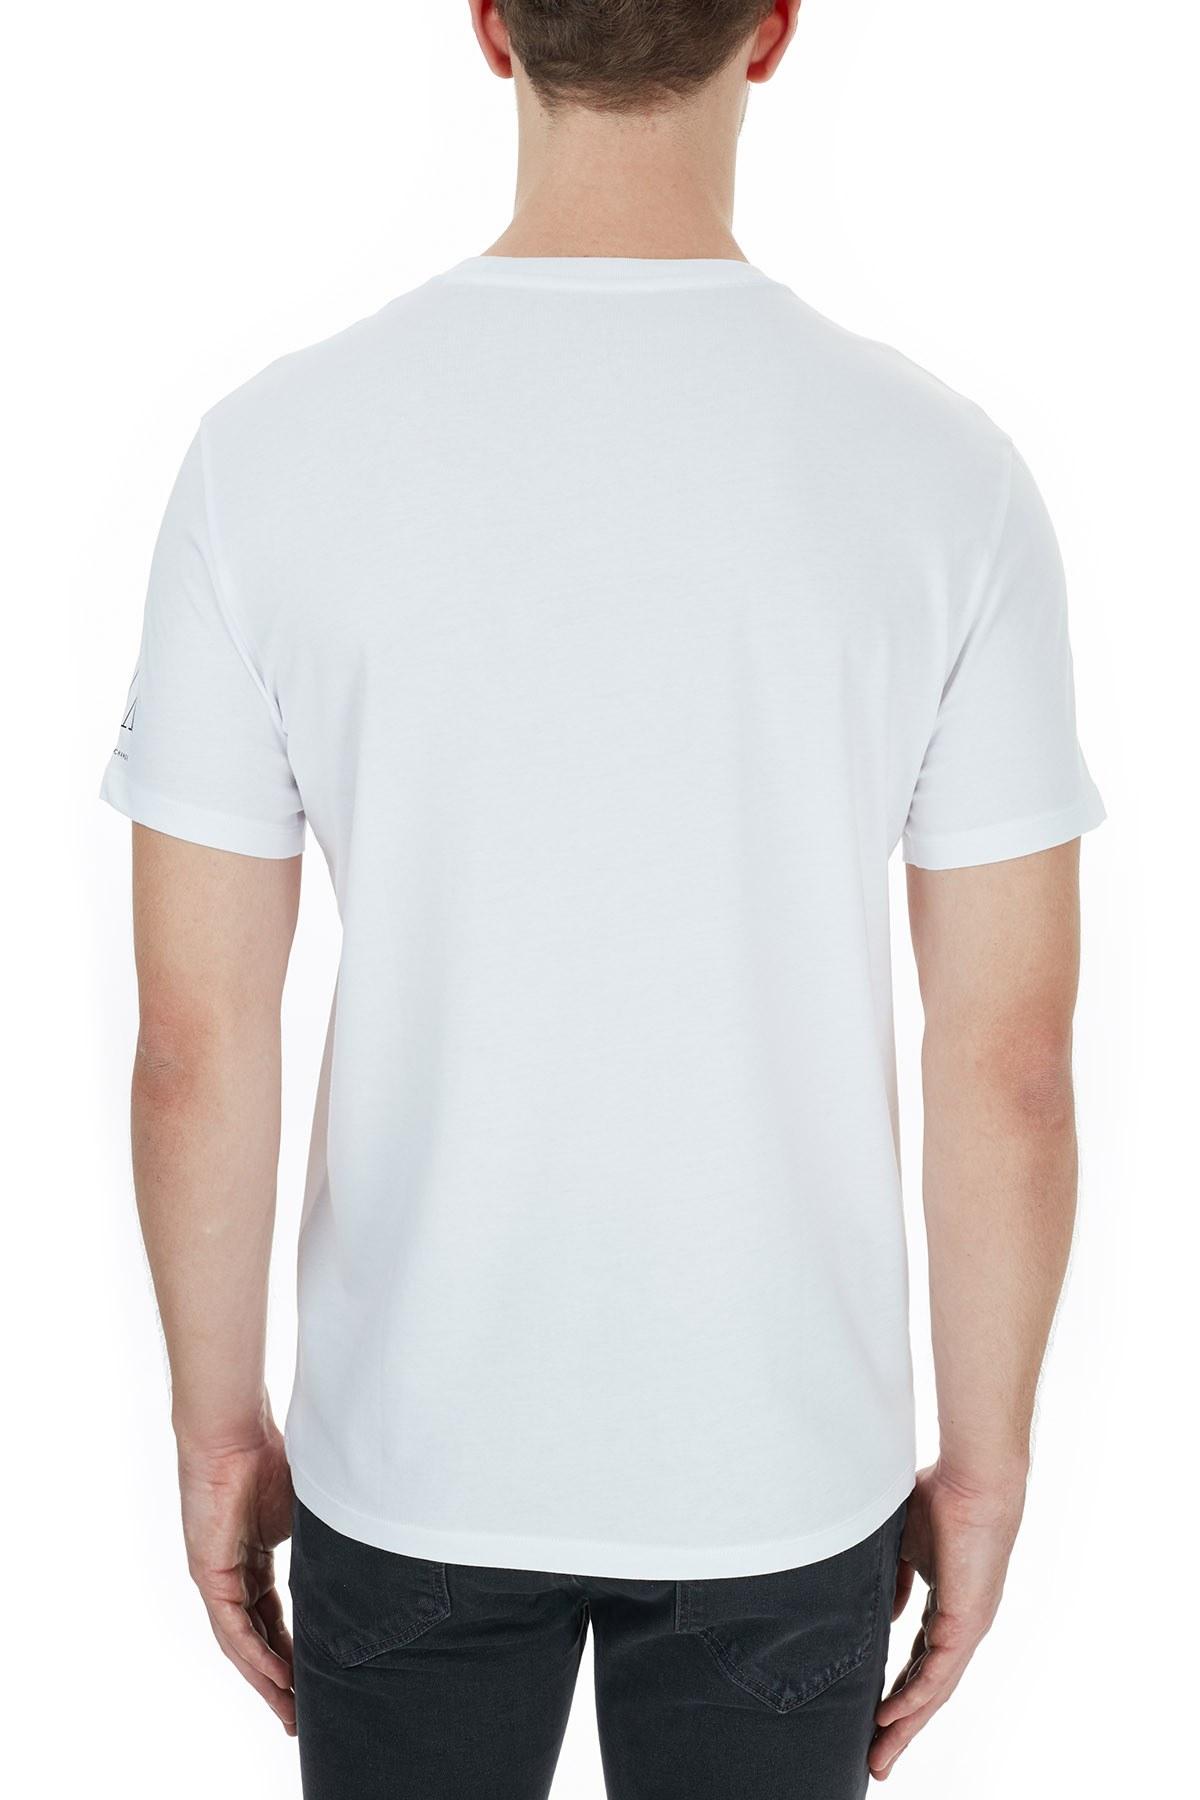 Armani Exchange % 100 Pamuklu Baskılı Bisiklet Yaka Erkek T Shirt 6HZTJF ZJH4Z 9100 BEYAZ